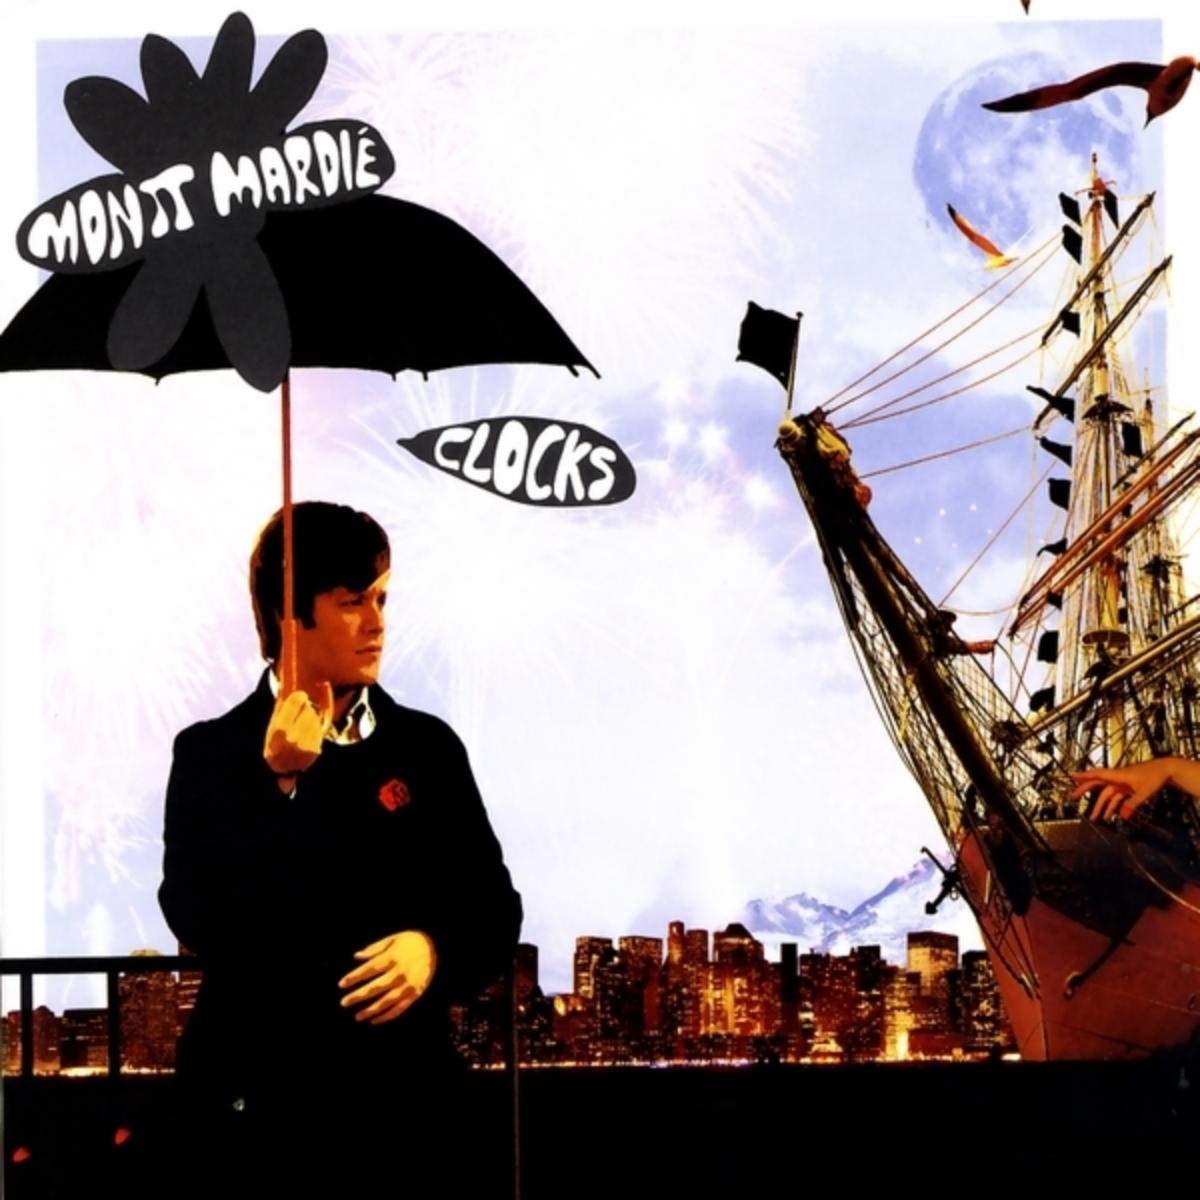 Montt Mardie-Clocks-Pretender-2CD-FLAC-2007-THEVOiD